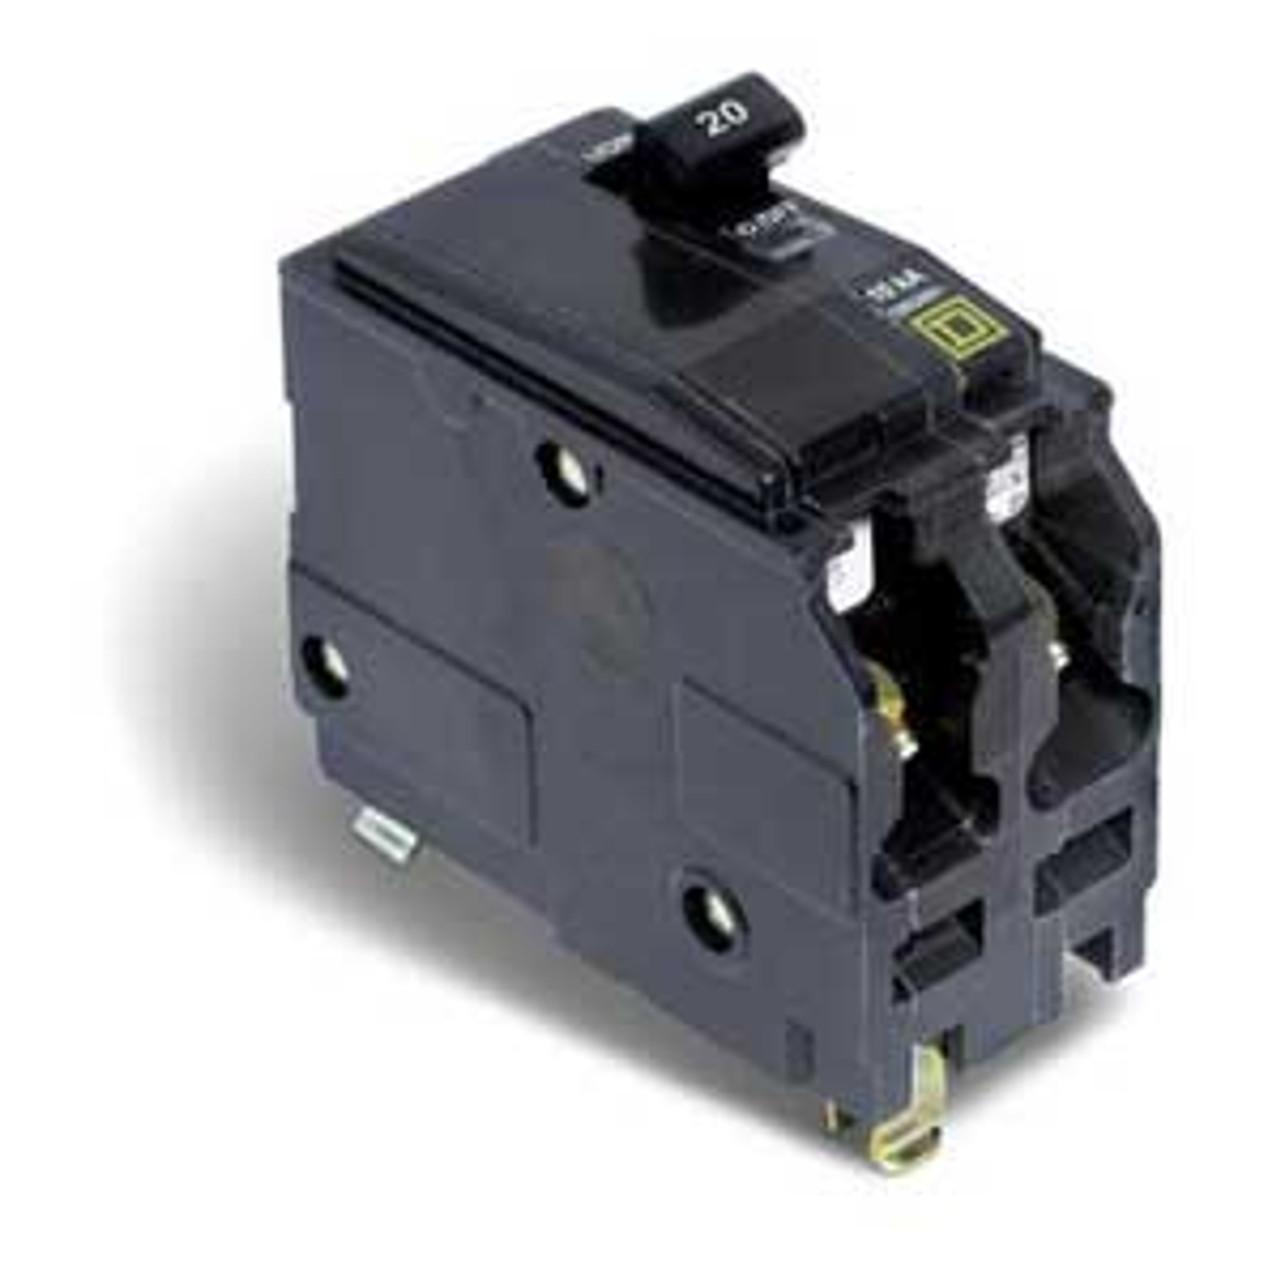 Square D QOH260 2 Pole 60 Amp 240V 42K Circuit Breaker New Style - Used